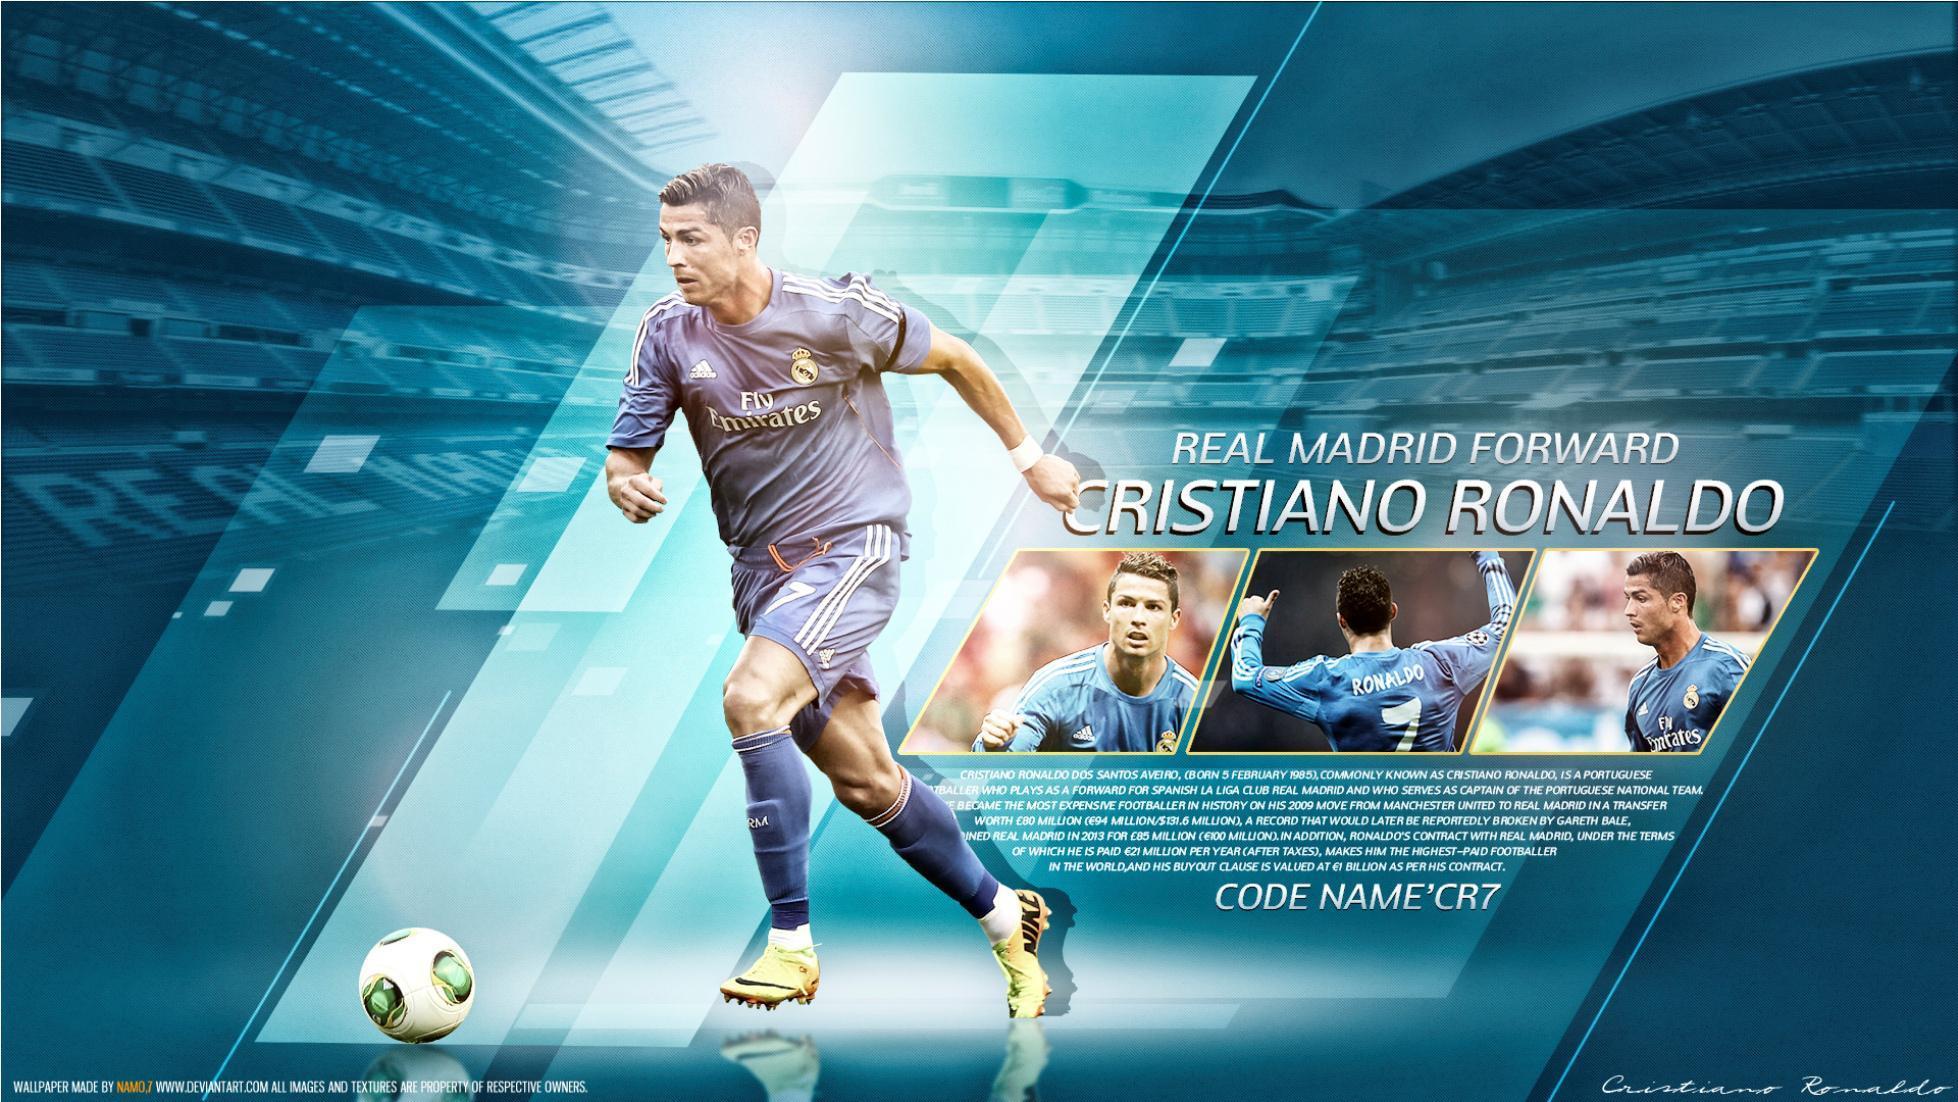 Real Madrid D Fly Emirates Cristiano Ronaldo Real Madrid 2014 Hq Hd Desktop Wallpaper